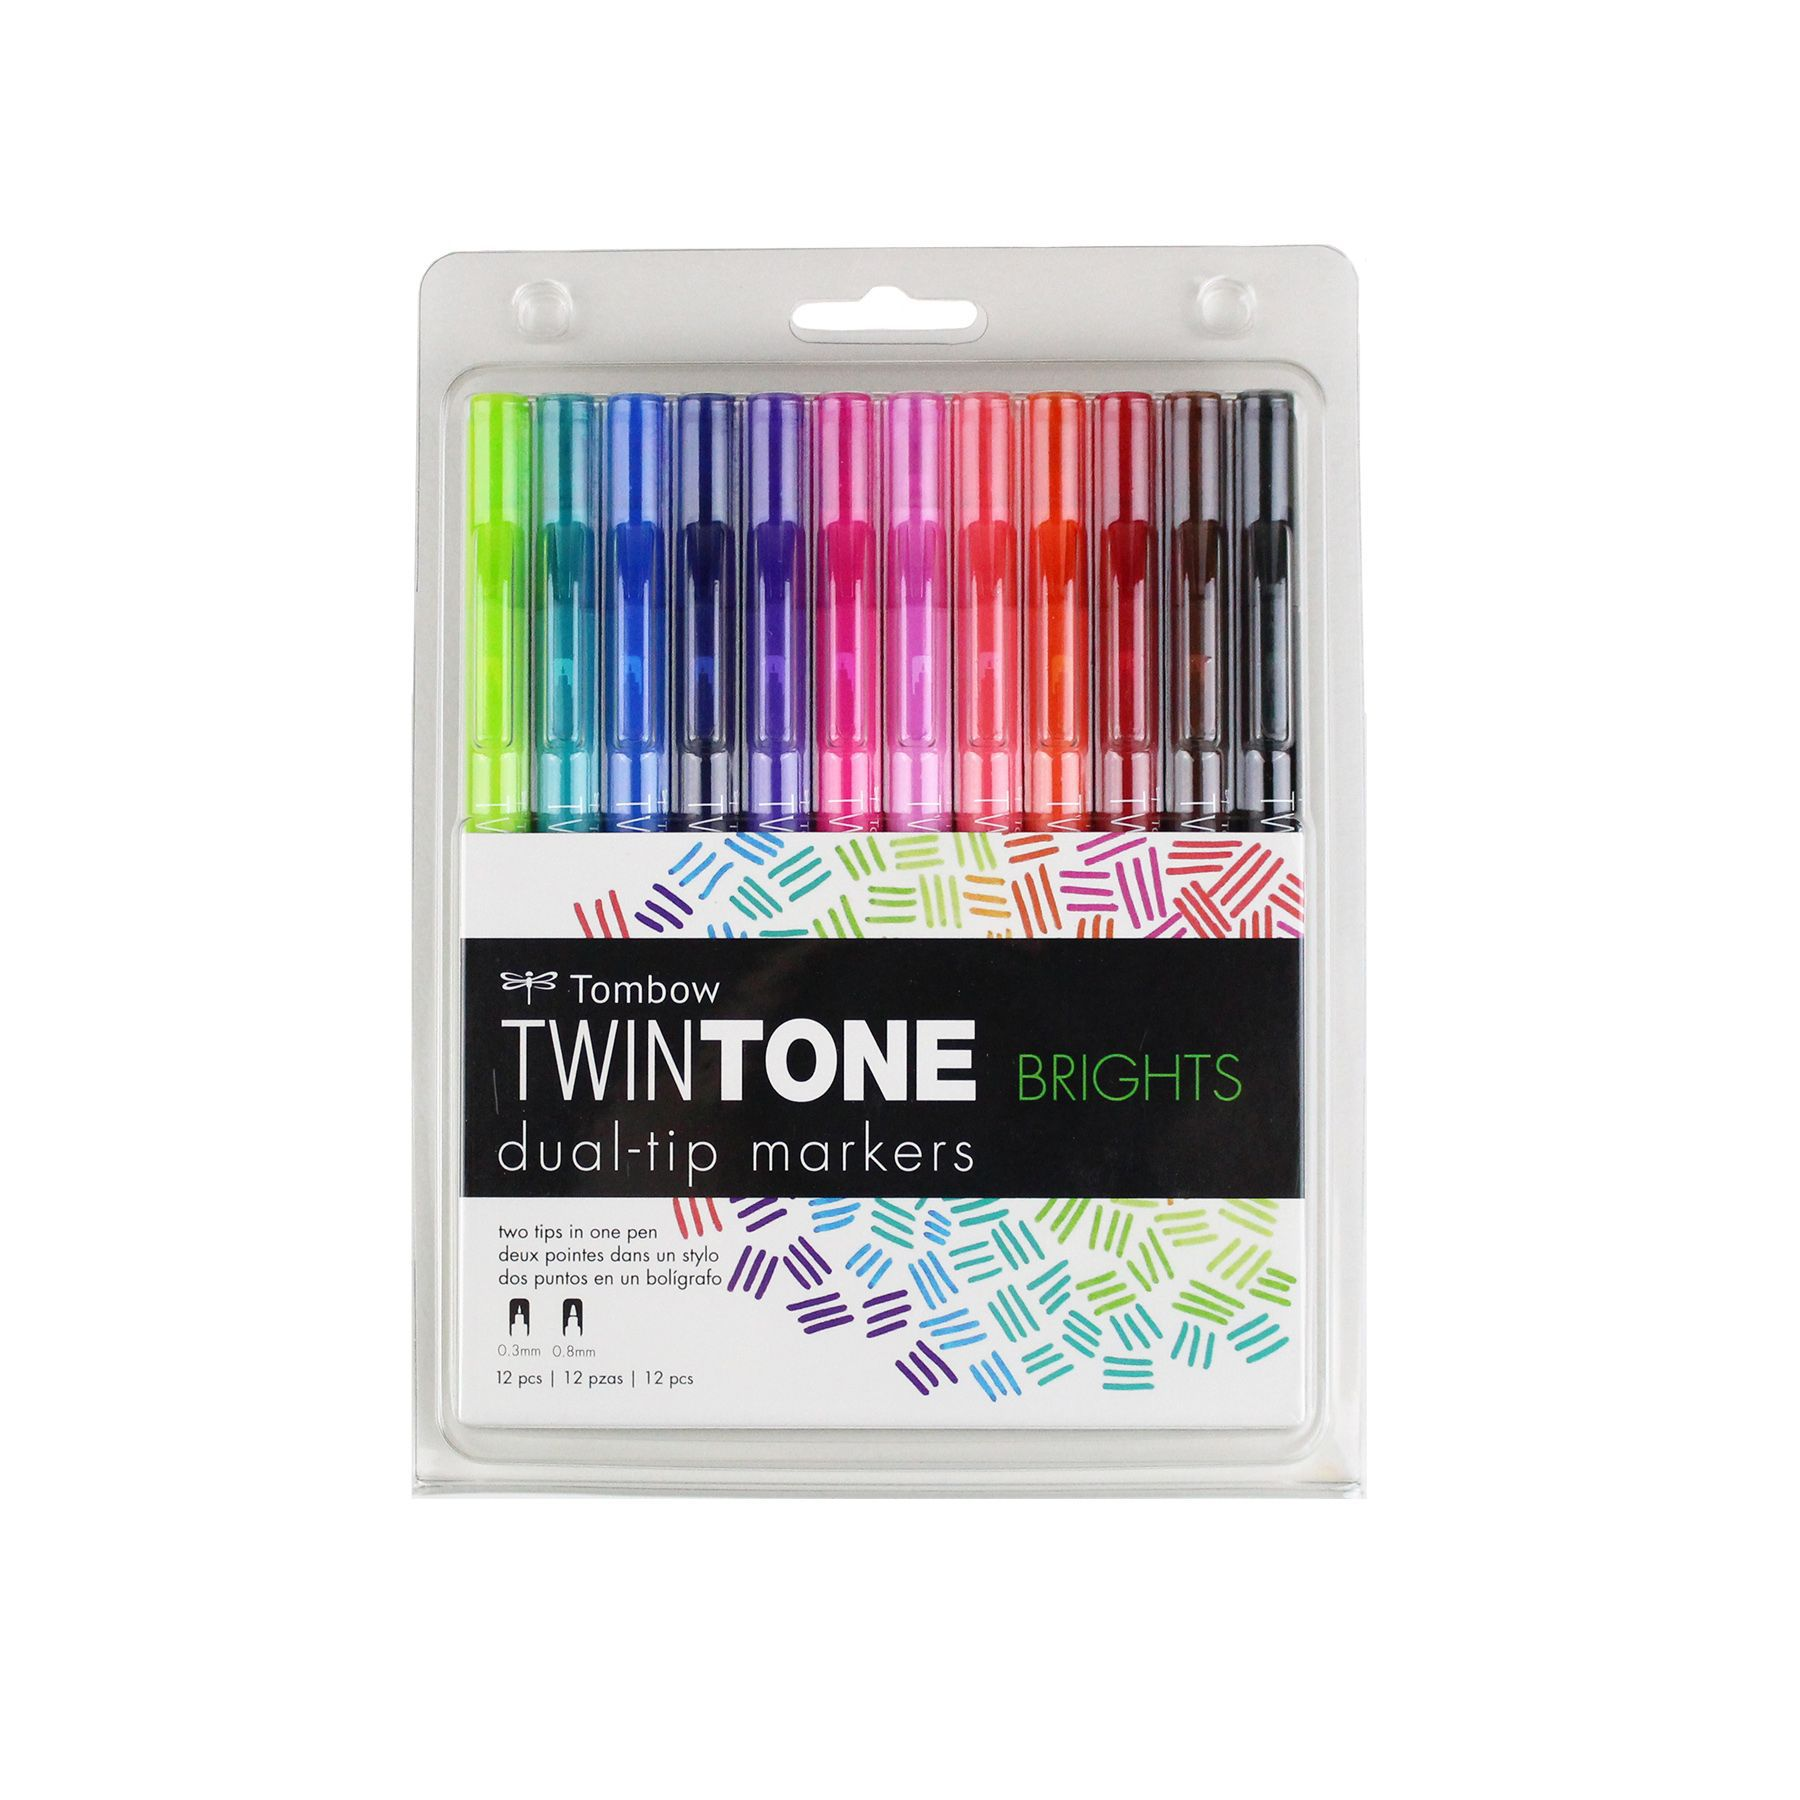 Caneta Tombow TwinTone Bright- 12 cores